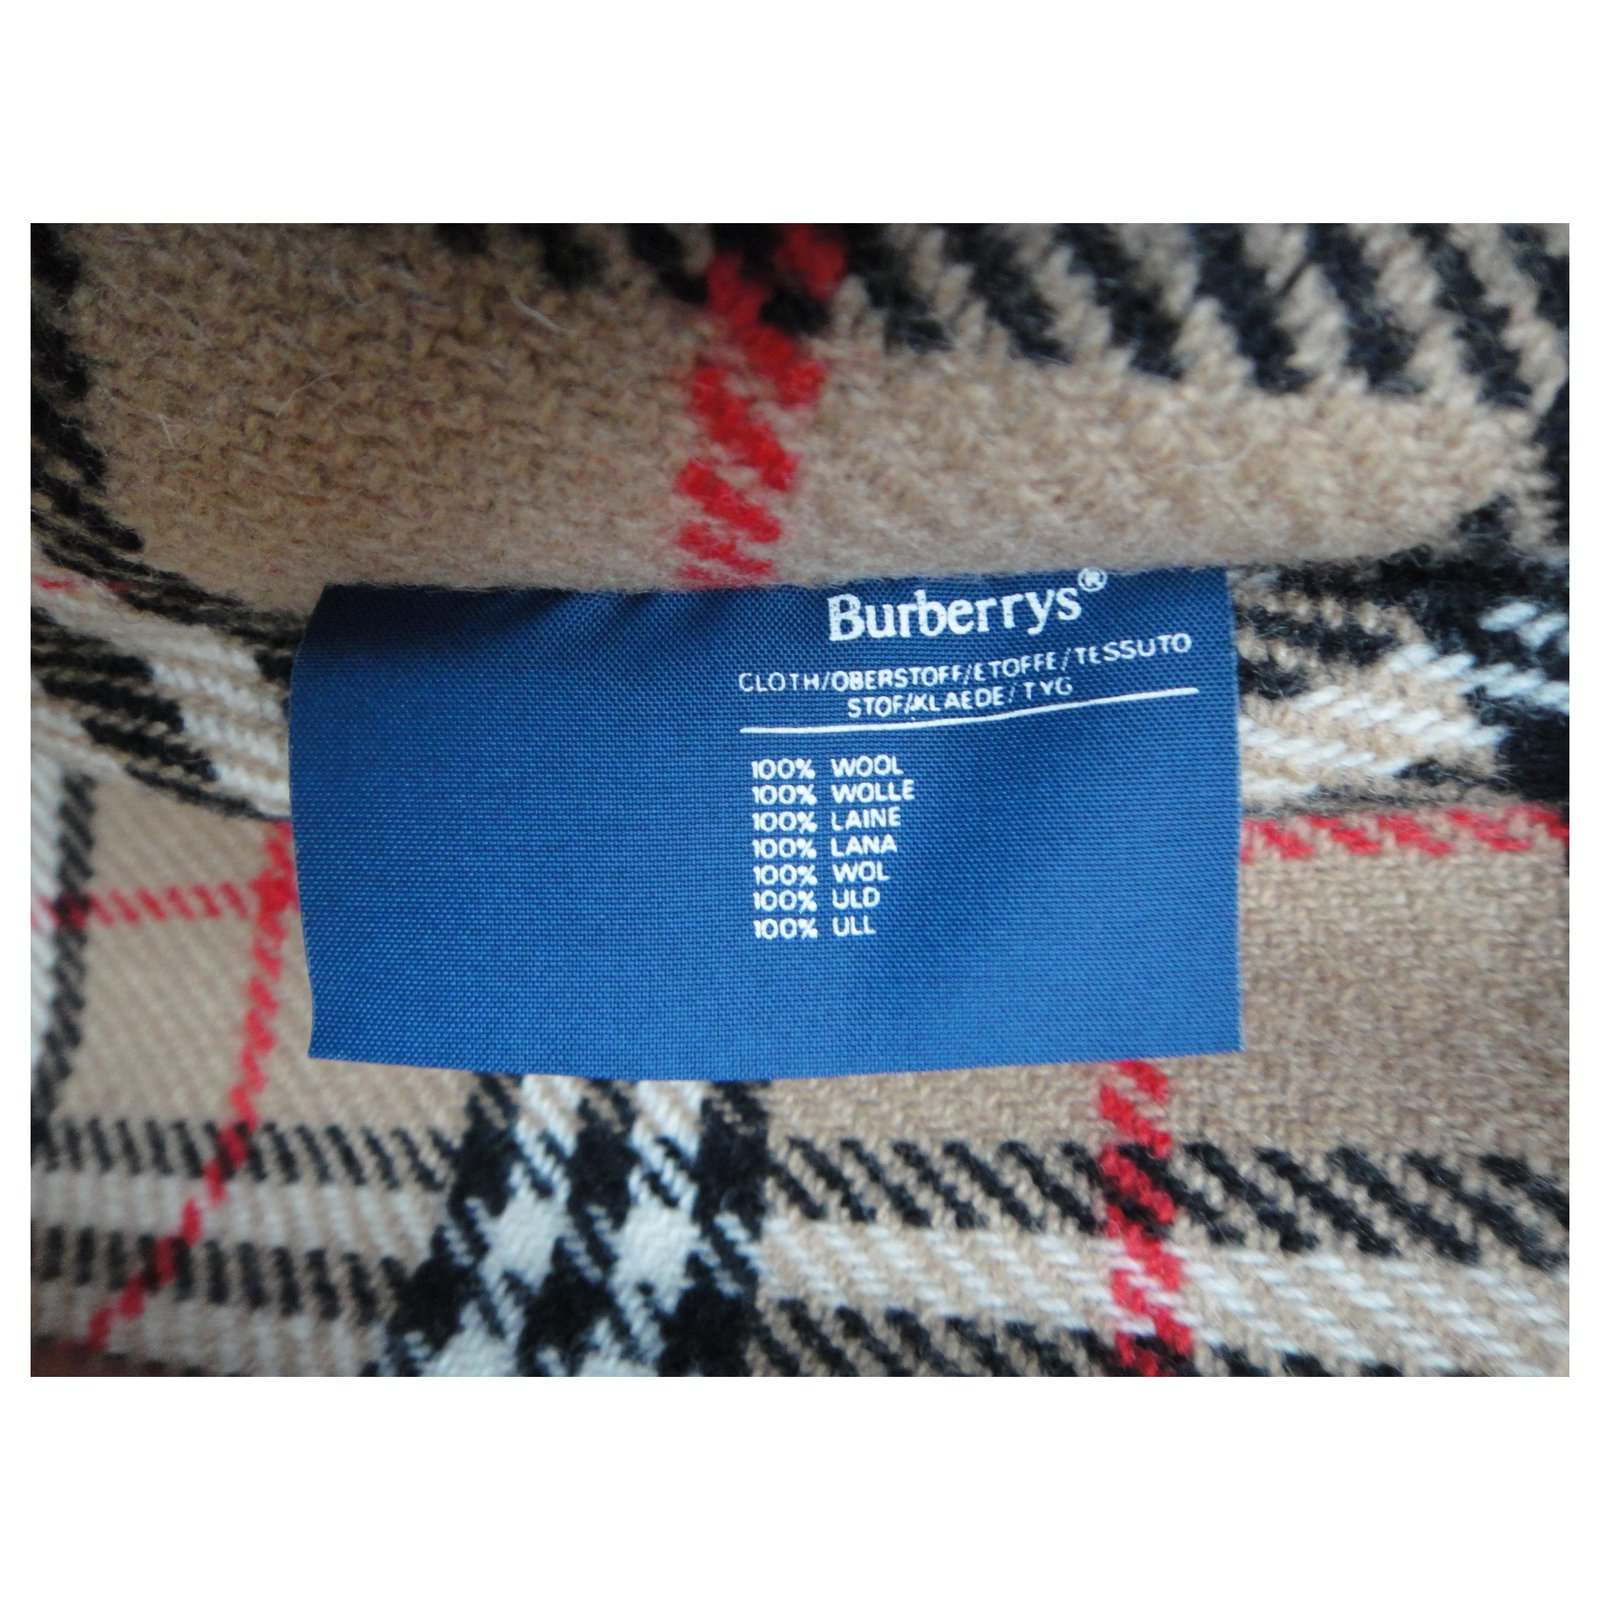 Vintage BURBERRYS Woolen Trench Coat | Veste BURBERRY laine